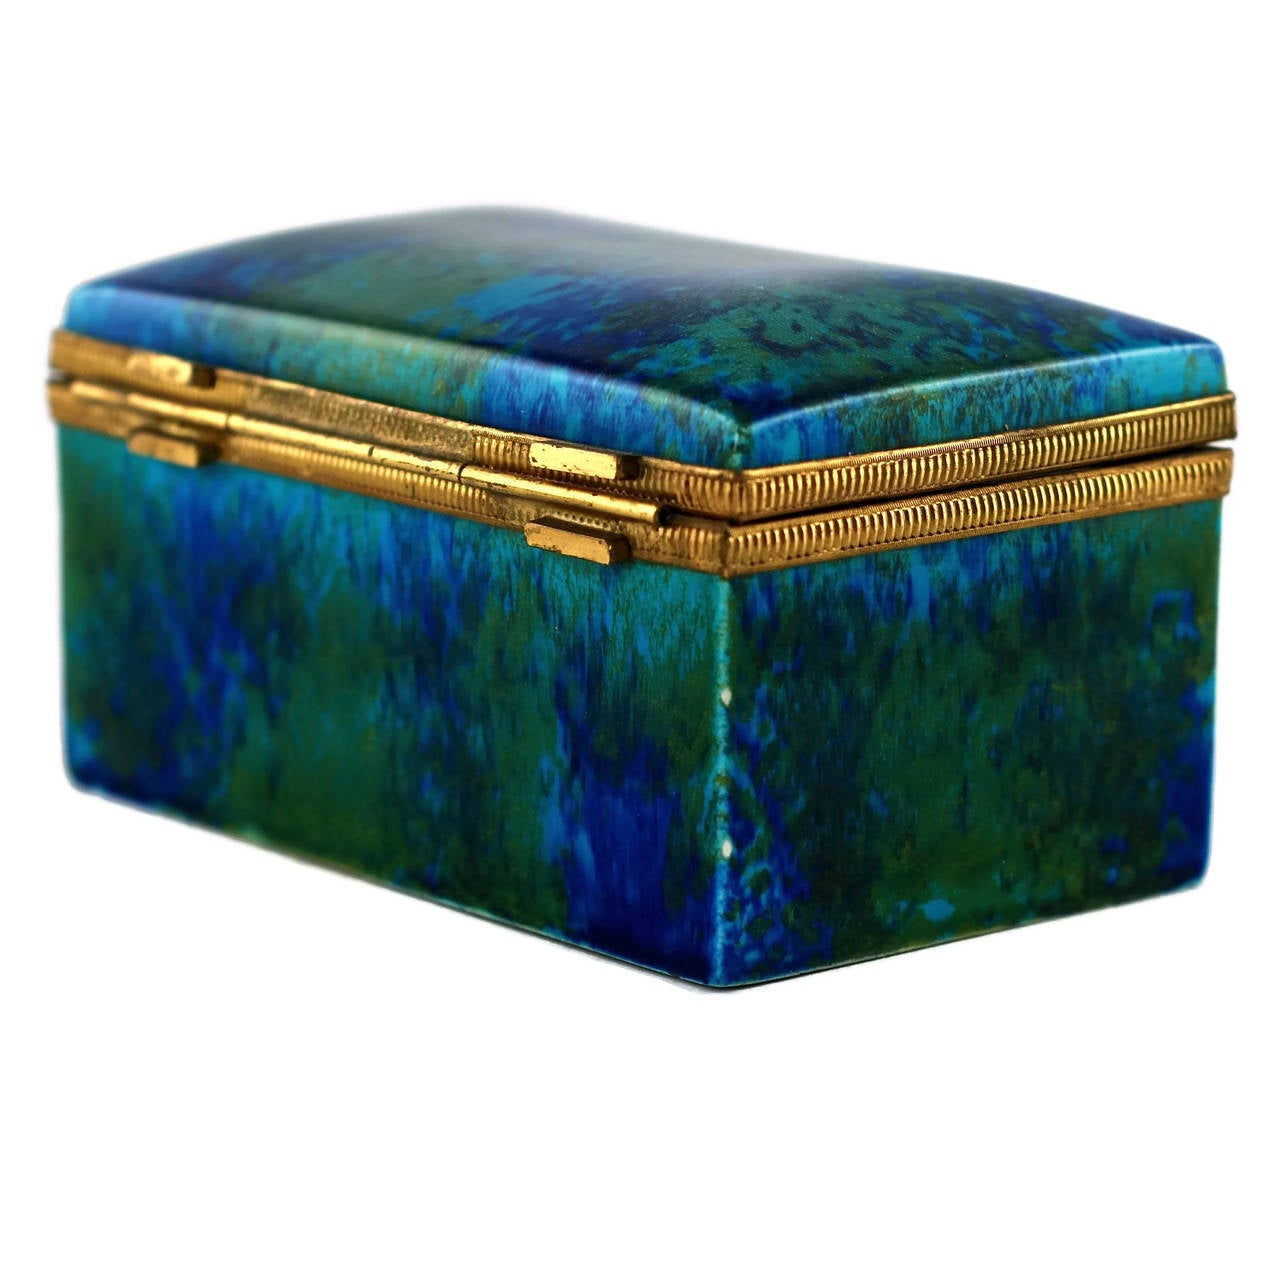 20th Century Paul Milet Sèvres Porcelain Hinged Dresser Box with Ormolu Mounts For Sale